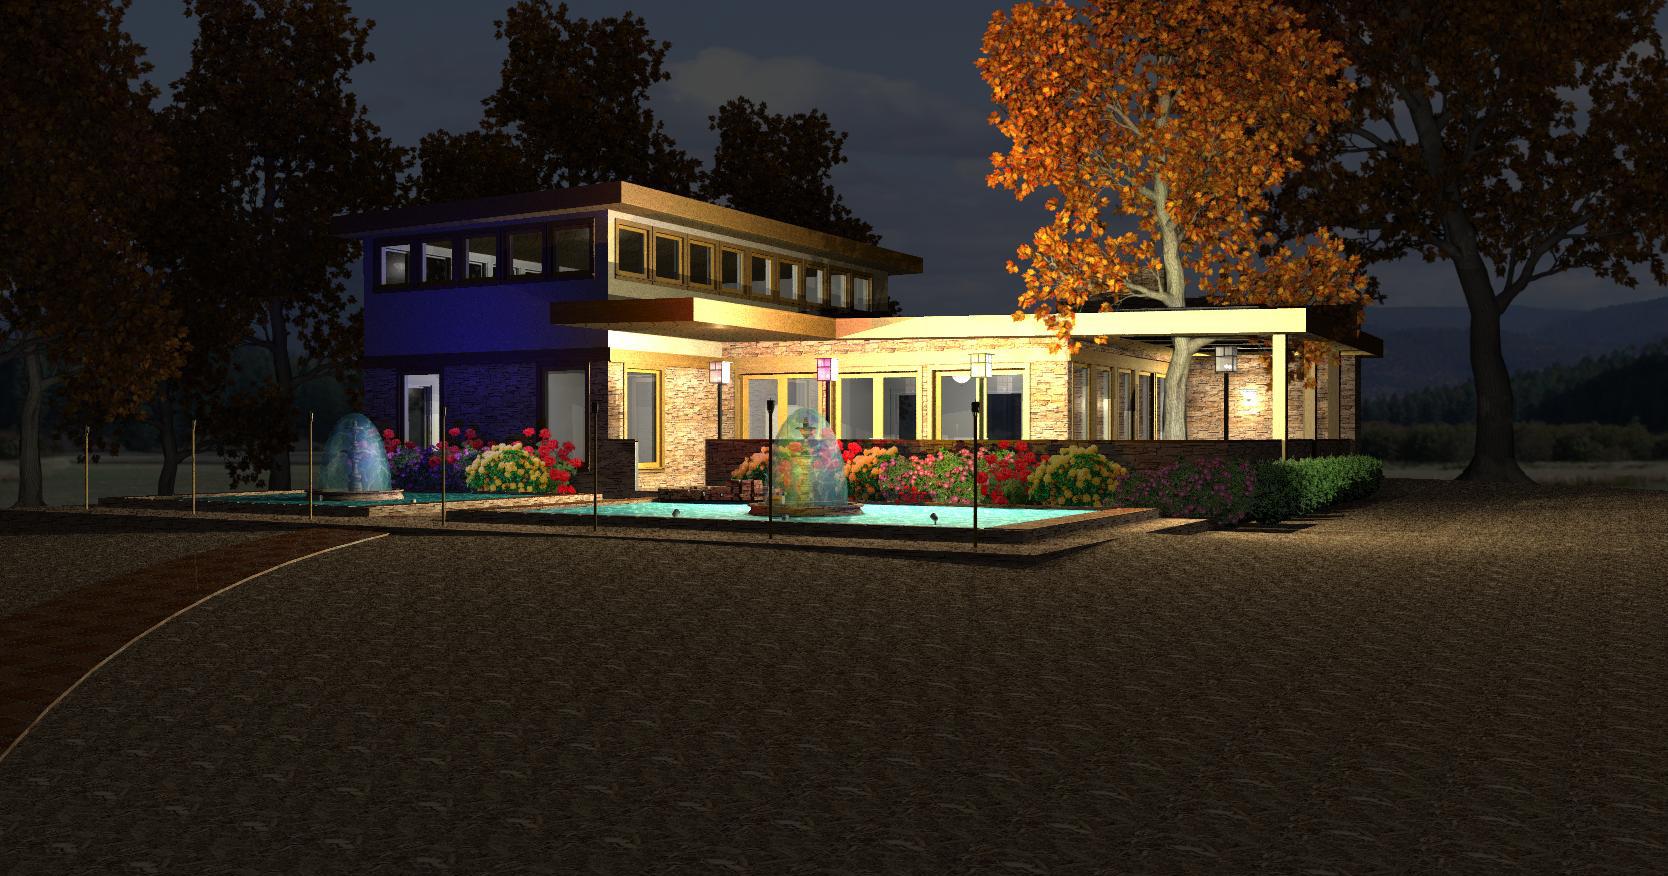 fka architectural graphics